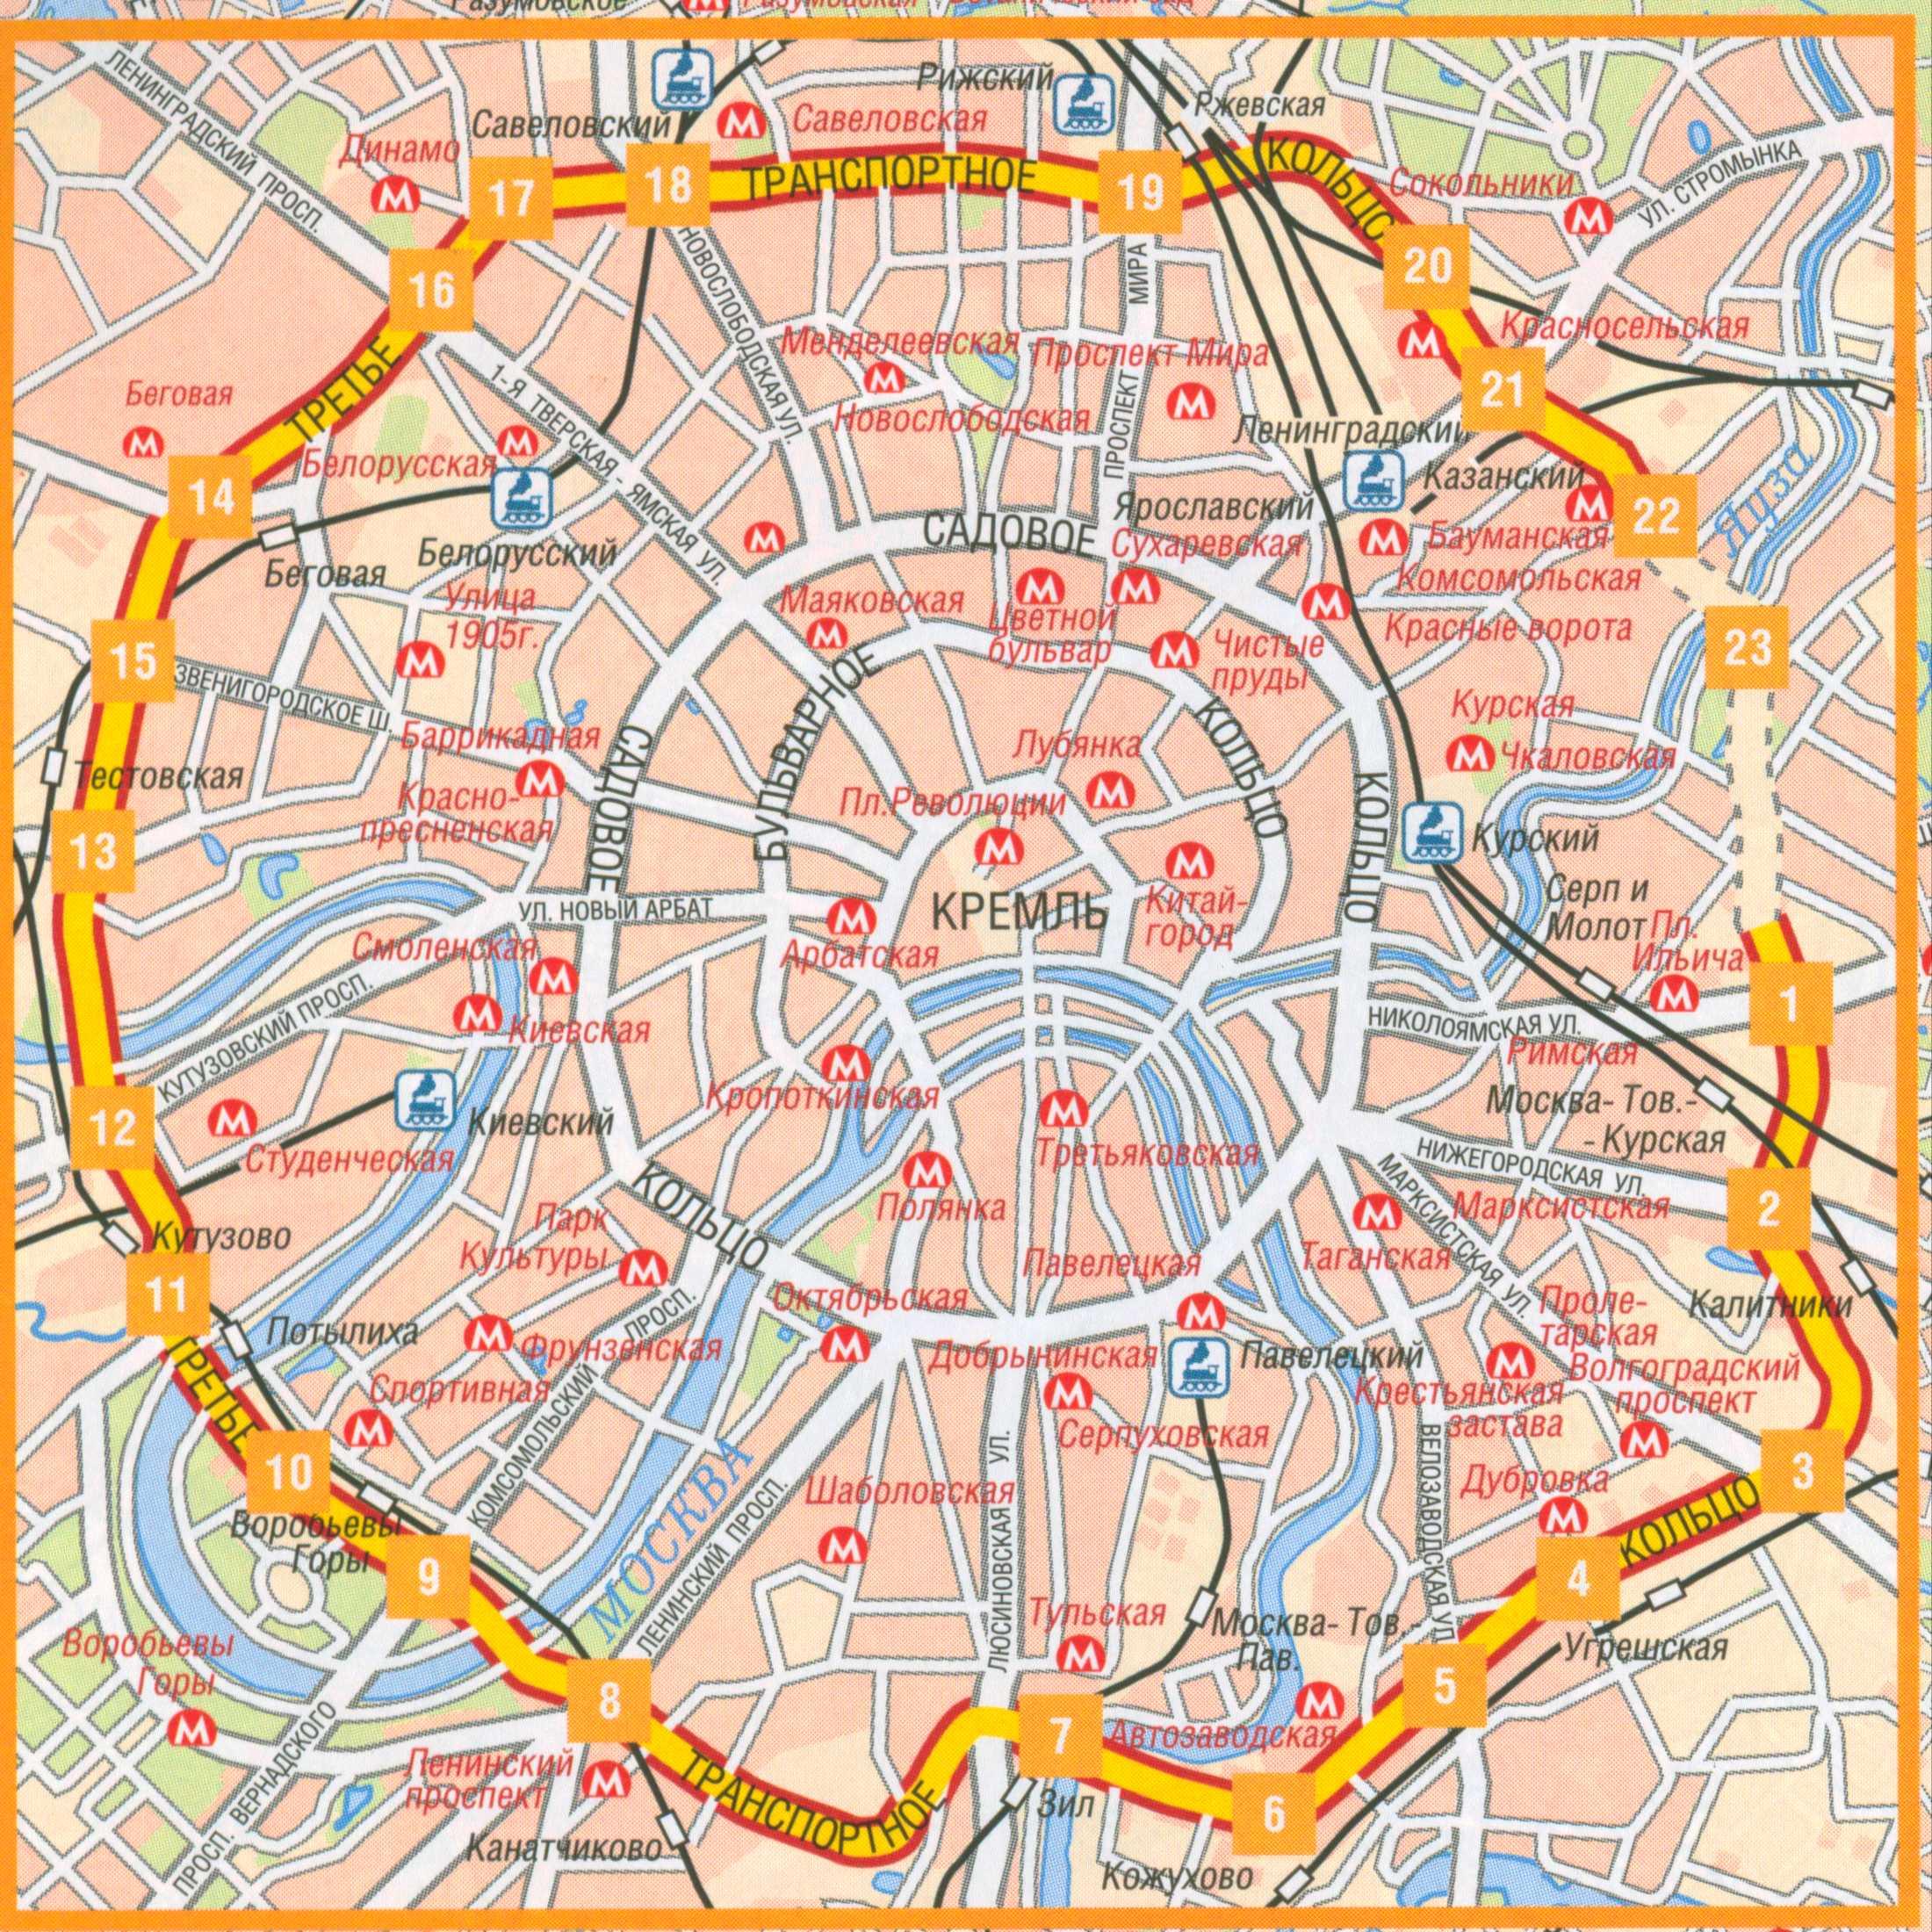 Четвертое Транспортное кольцо на карте Google.